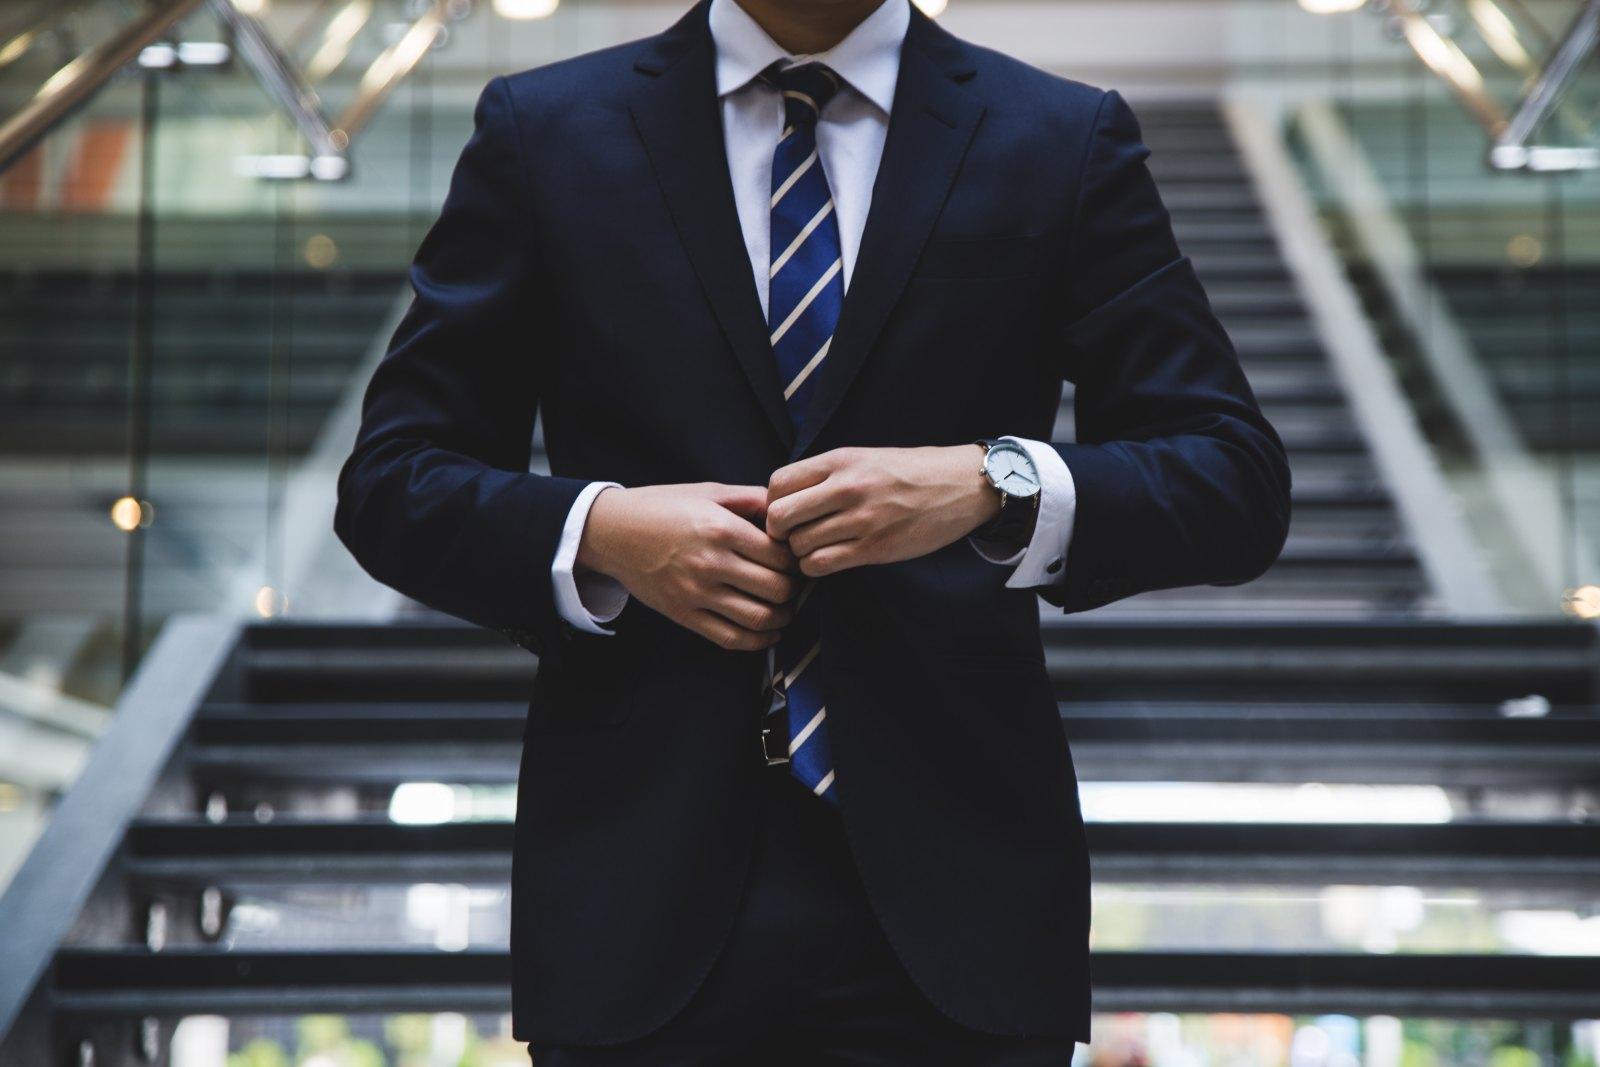 Interview skills, Job Interview Skills To Land the Job